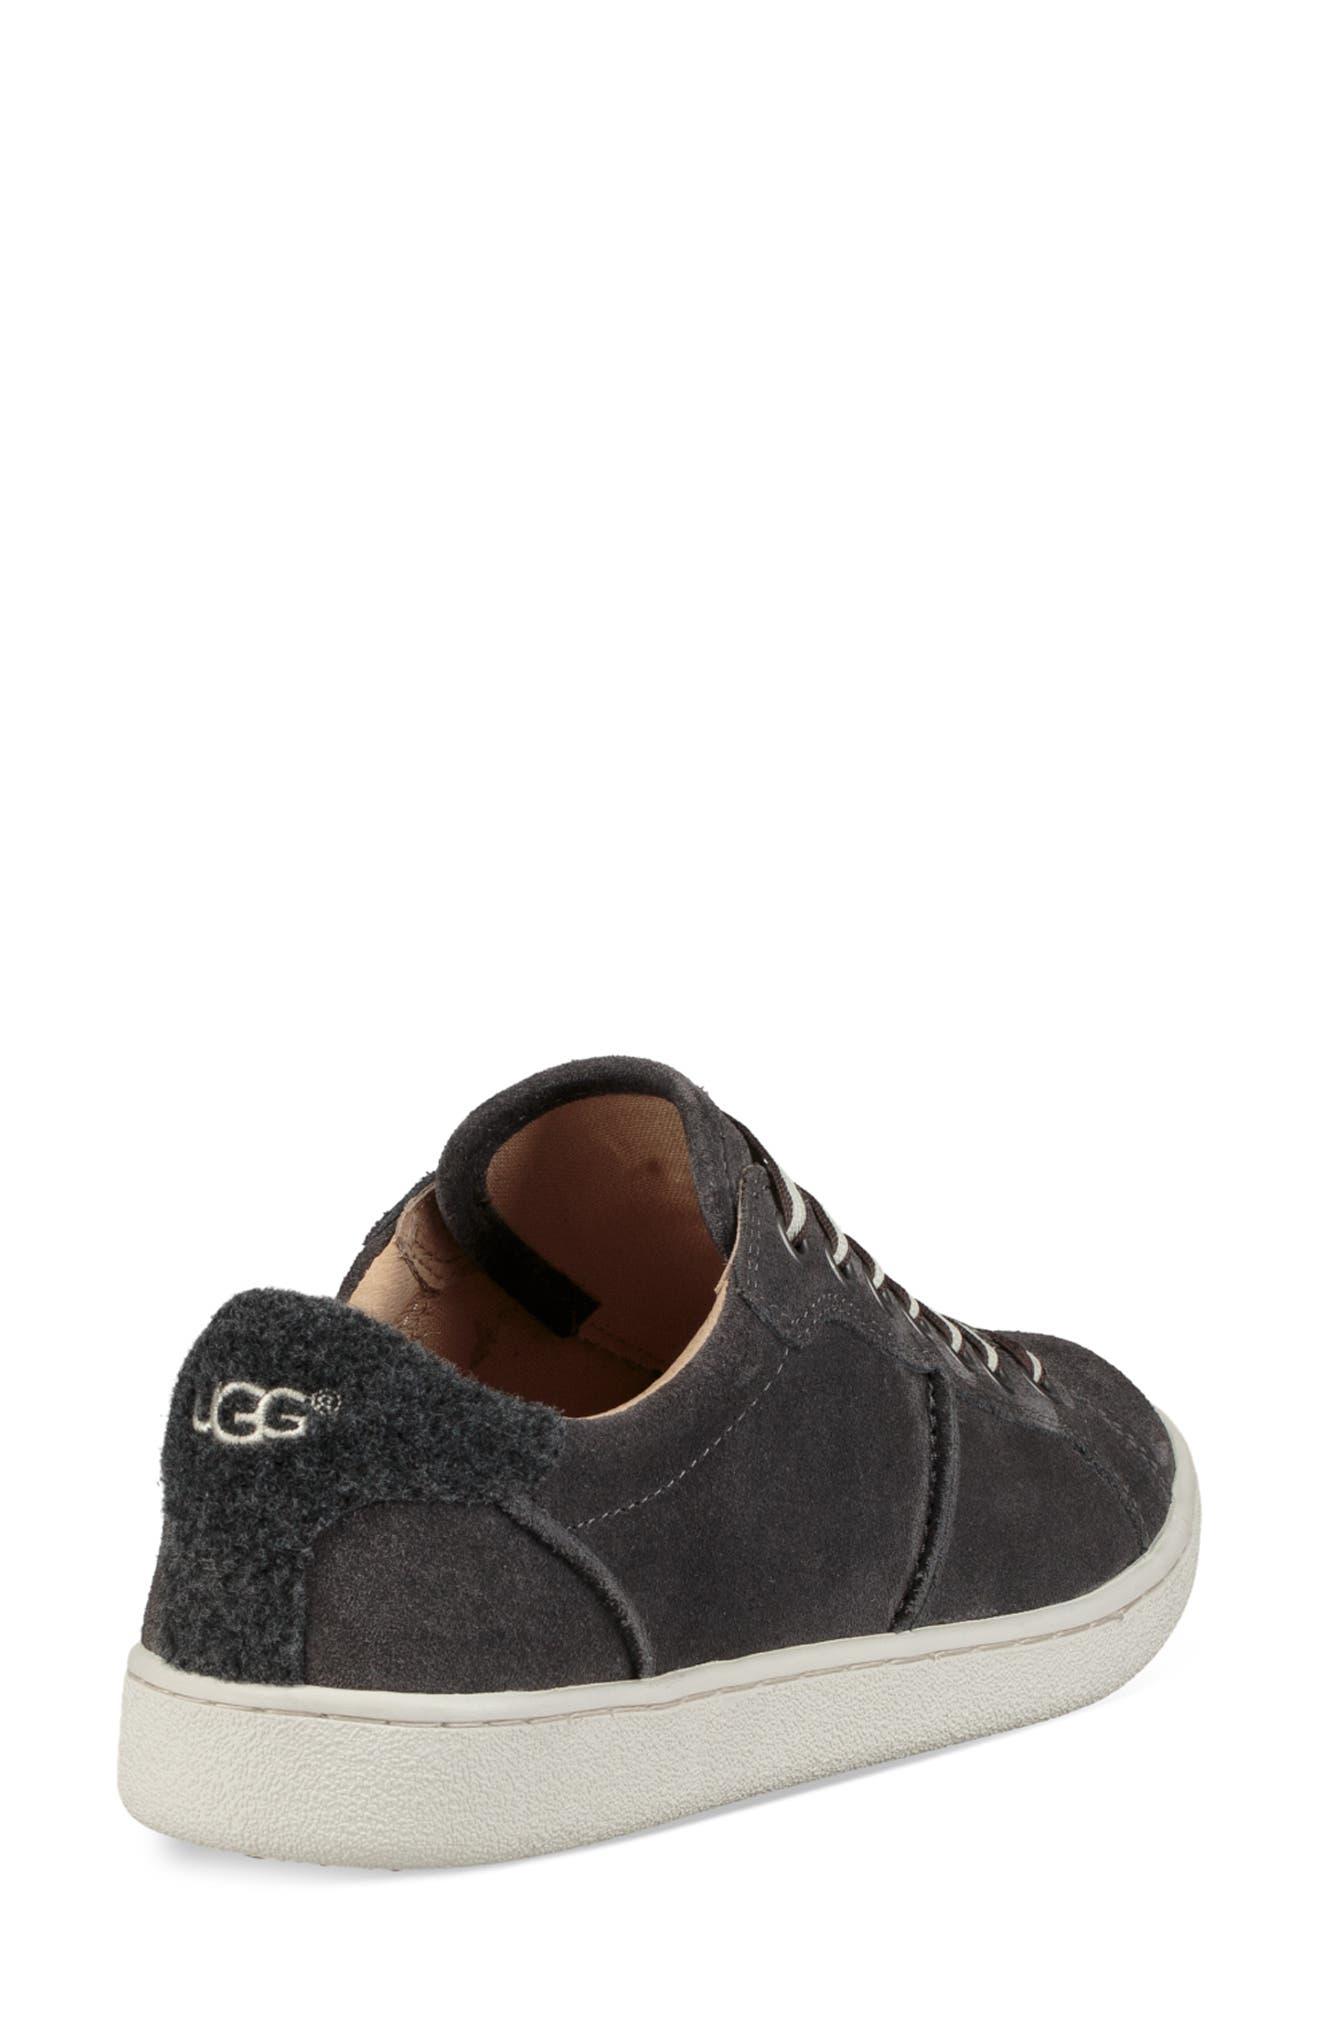 Milo Sneaker,                             Alternate thumbnail 2, color,                             CHARCOAL SUEDE